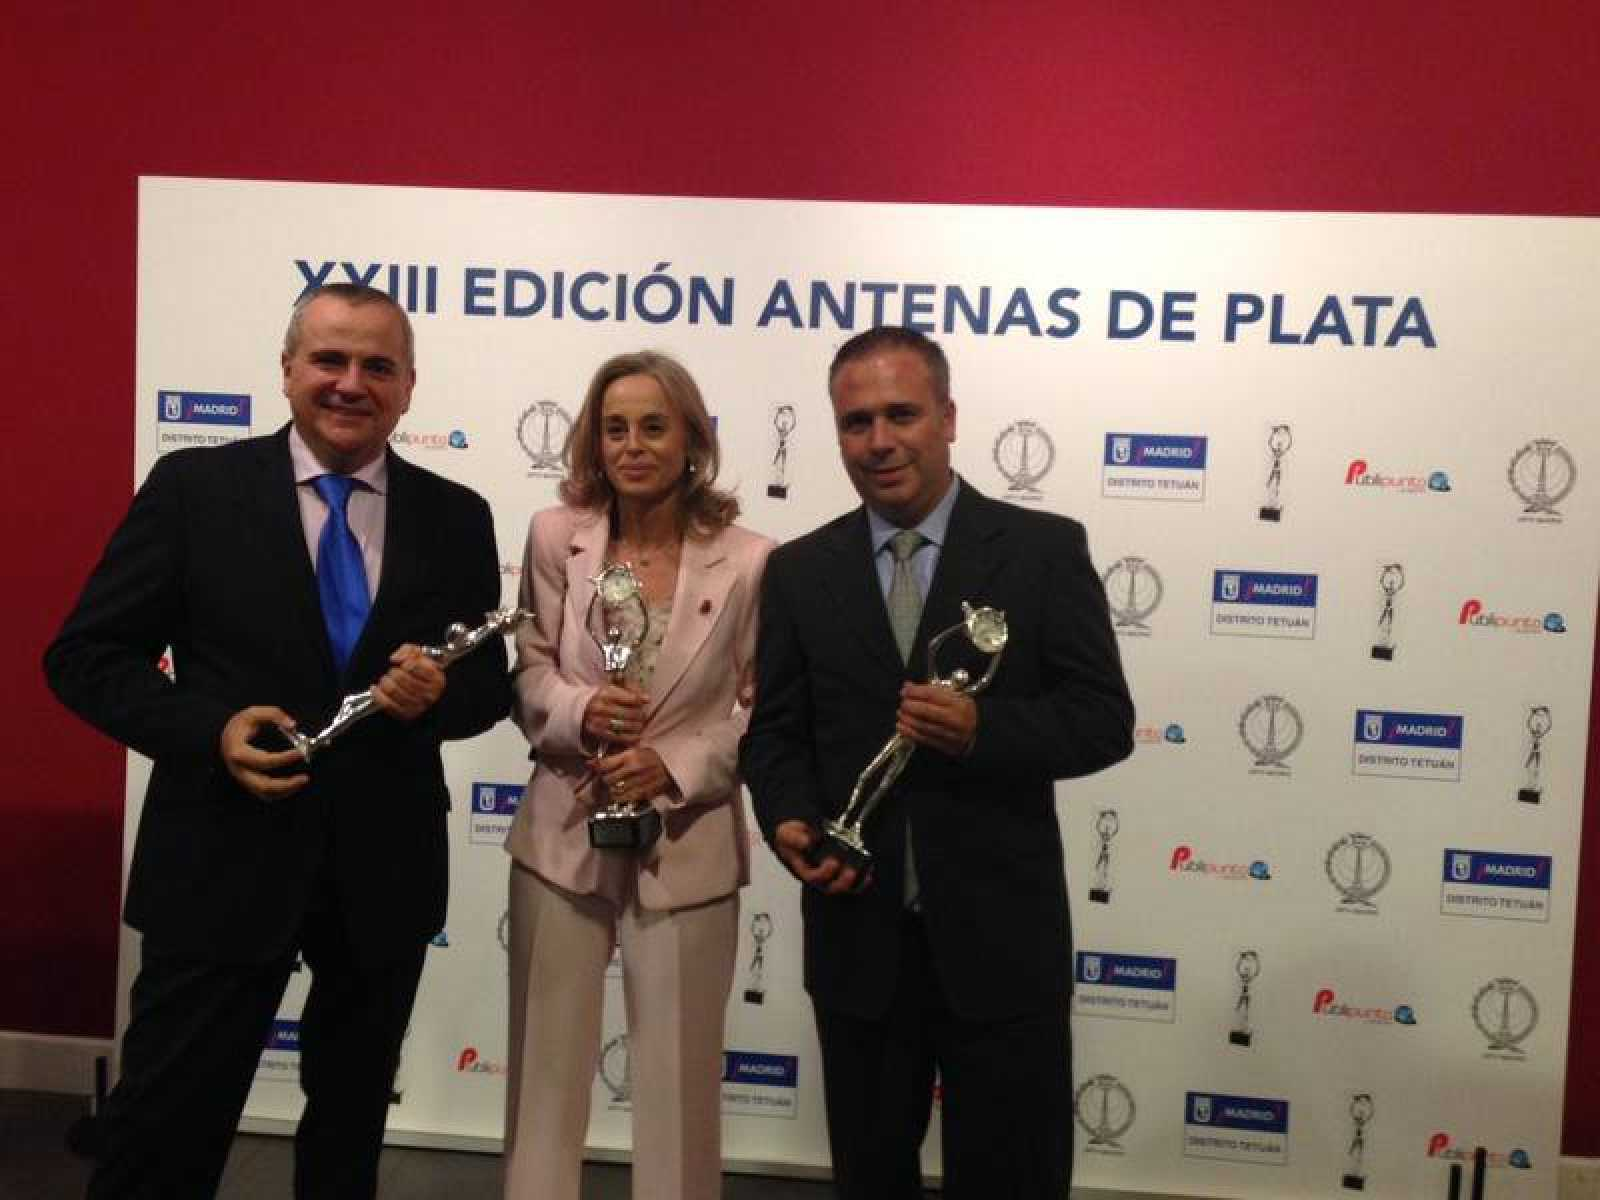 Premio 'Antena de Plata' para Juanma Romero